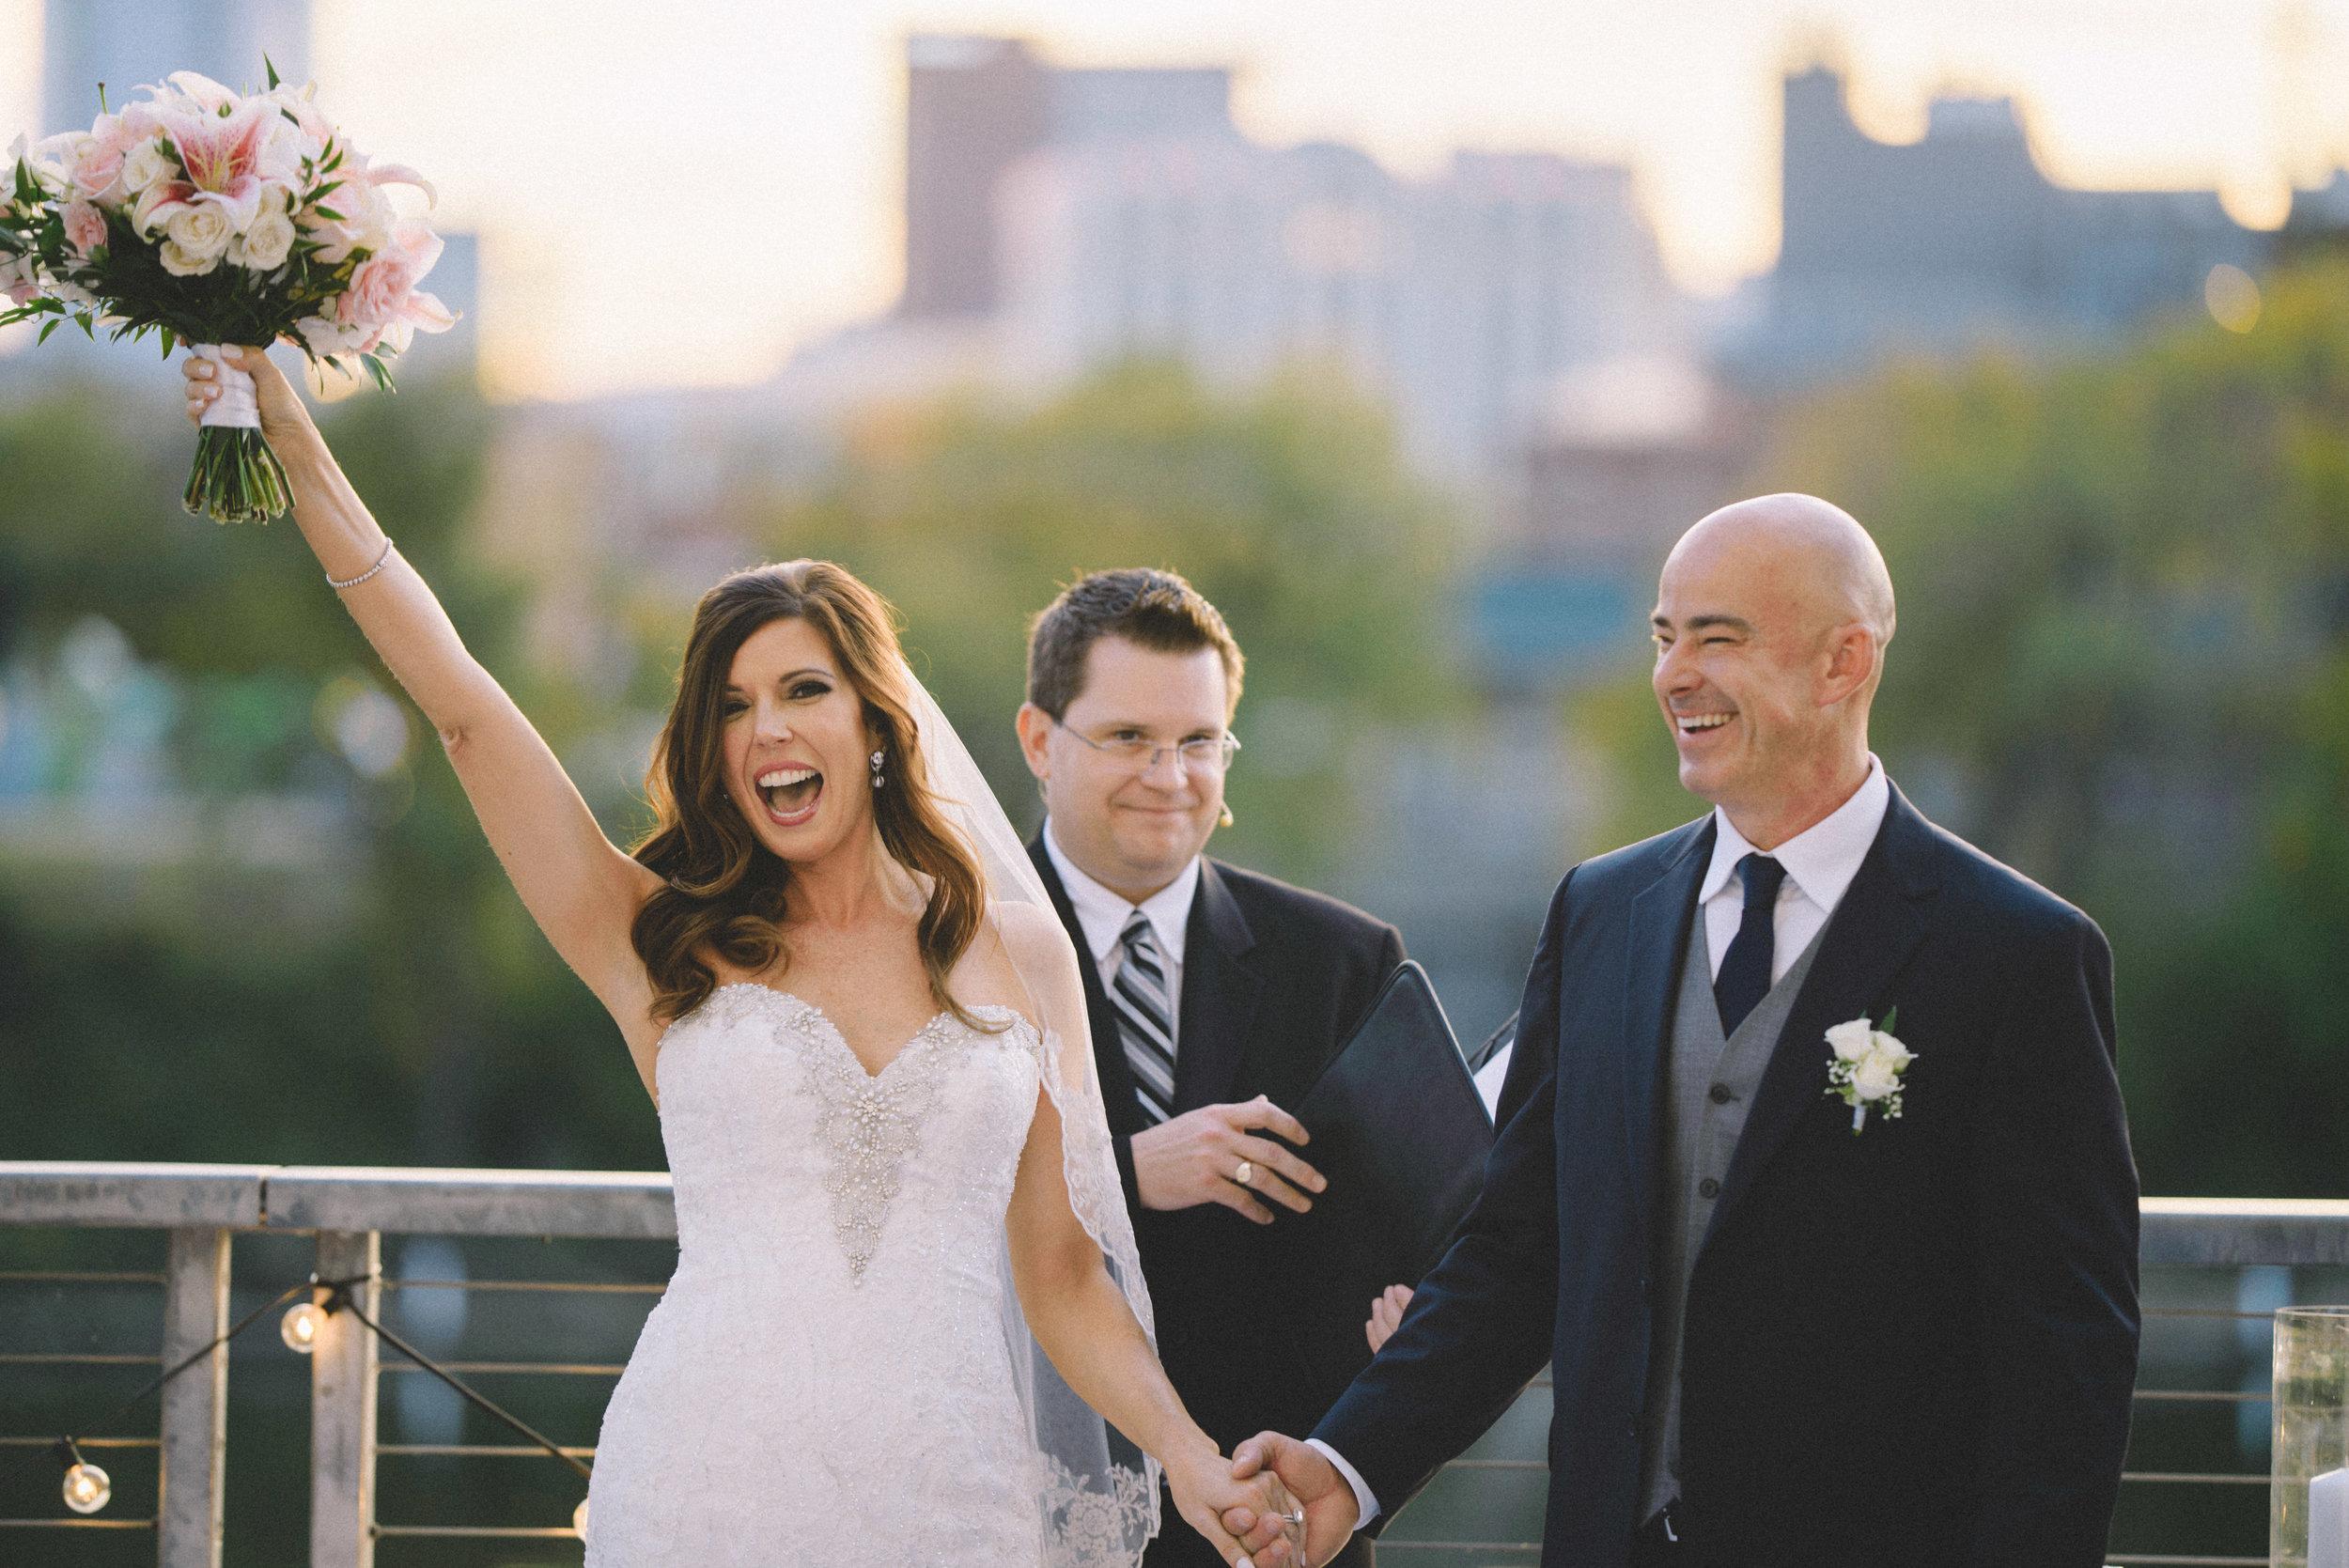 Christina + Matt Wedding - Details Nashville